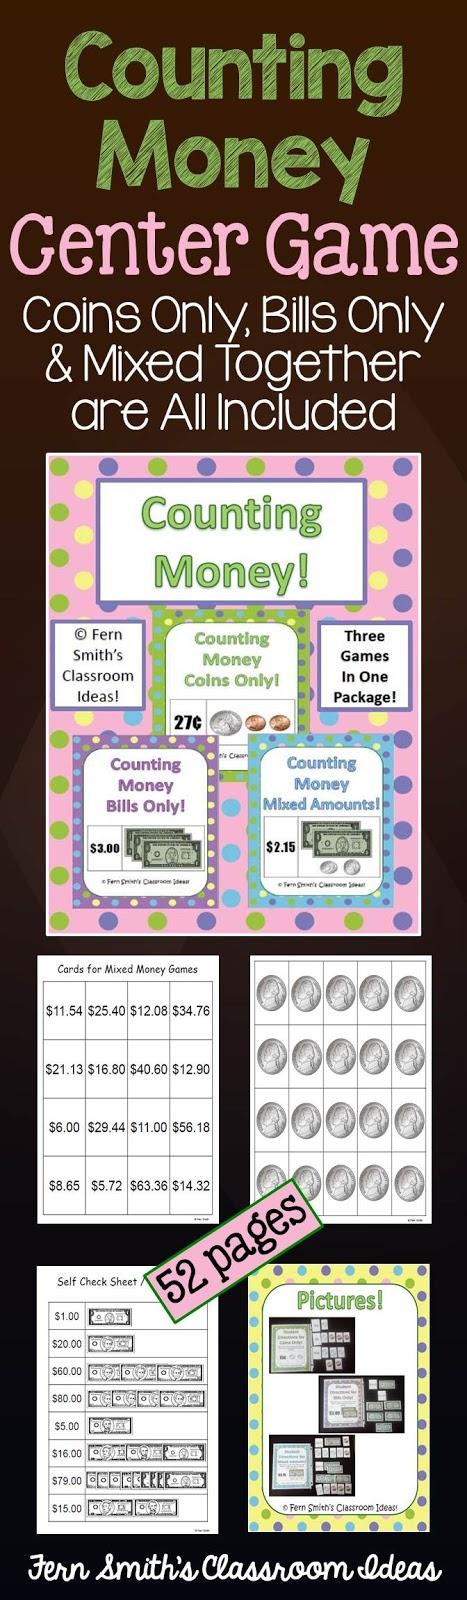 Fern Smith's Classroom Ideas Counting Money Center Game at TeachersPayTeachers